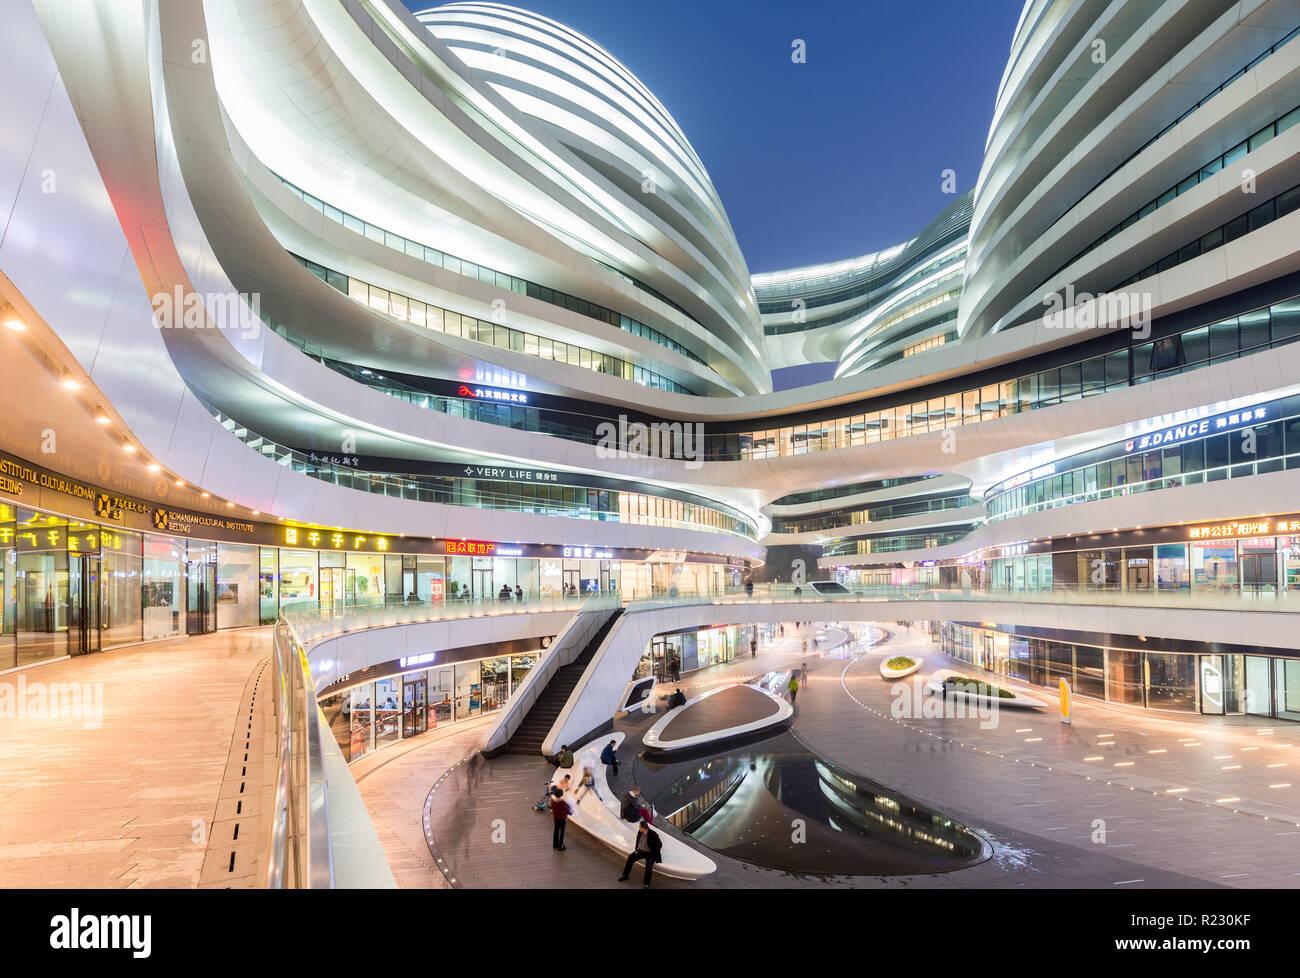 Galaxy SOHO building scene at night in Beijing, China. - Stock Image